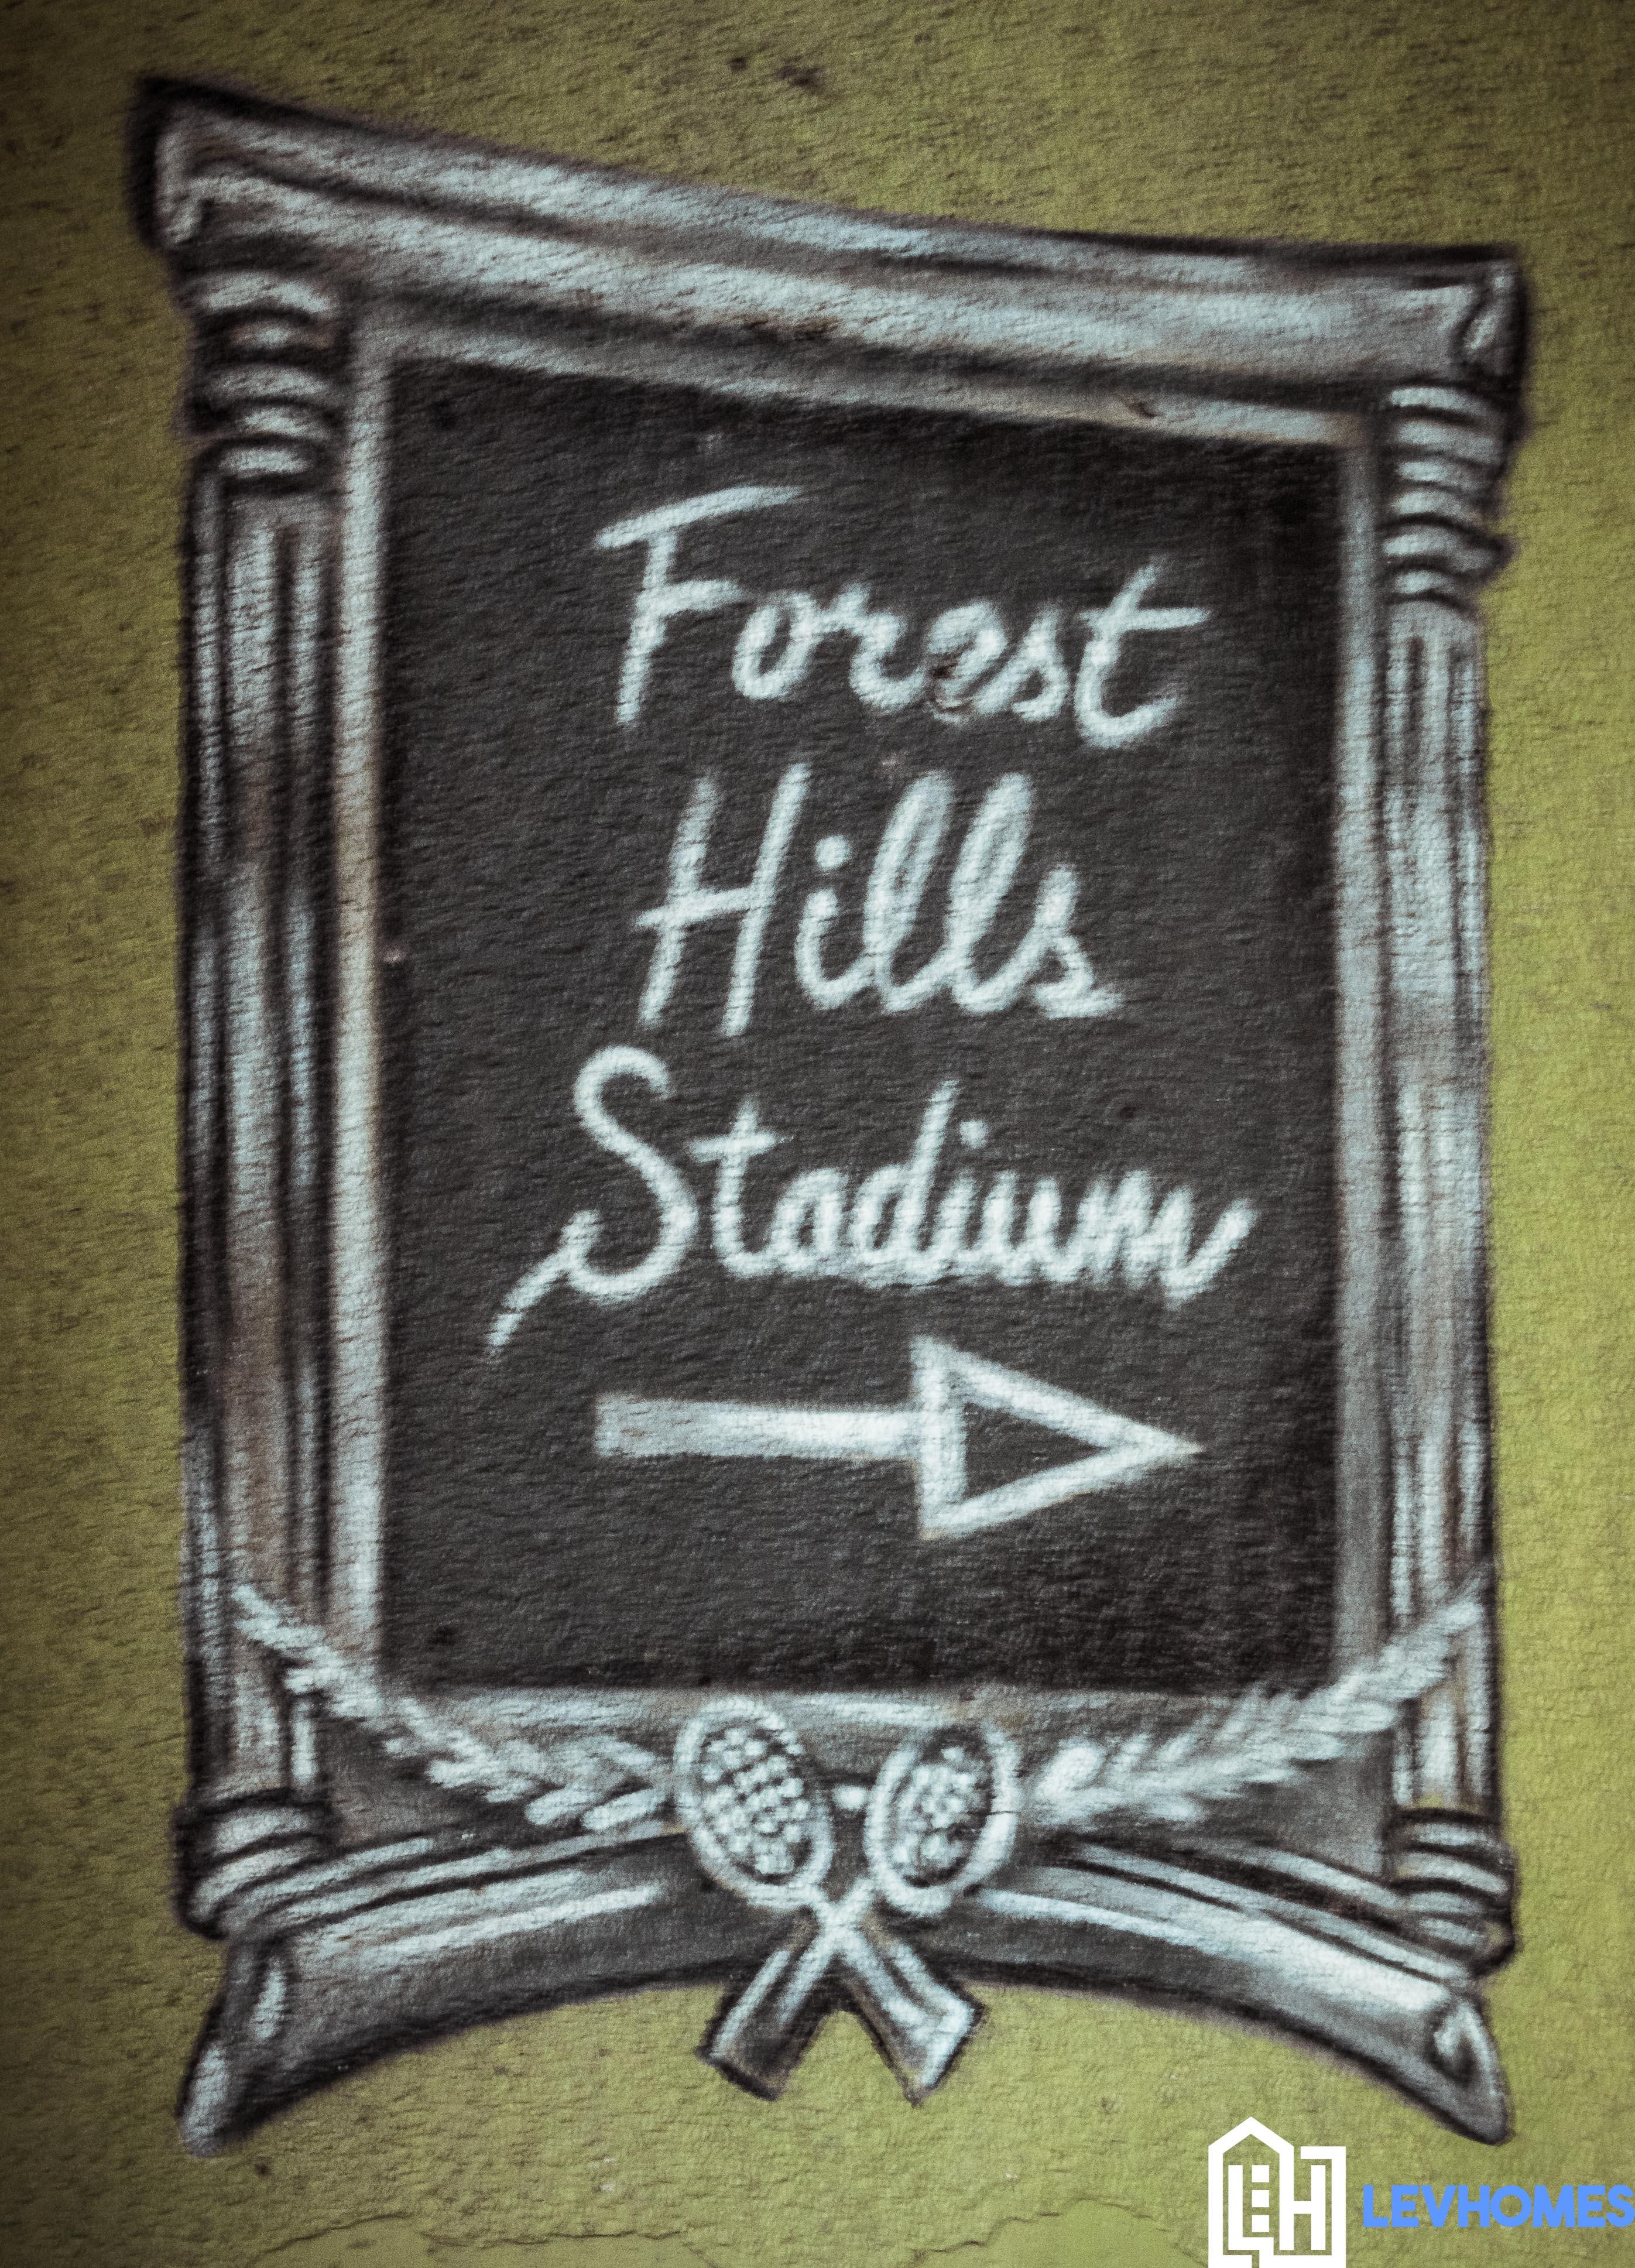 Forest Hills Stadium - Sign art